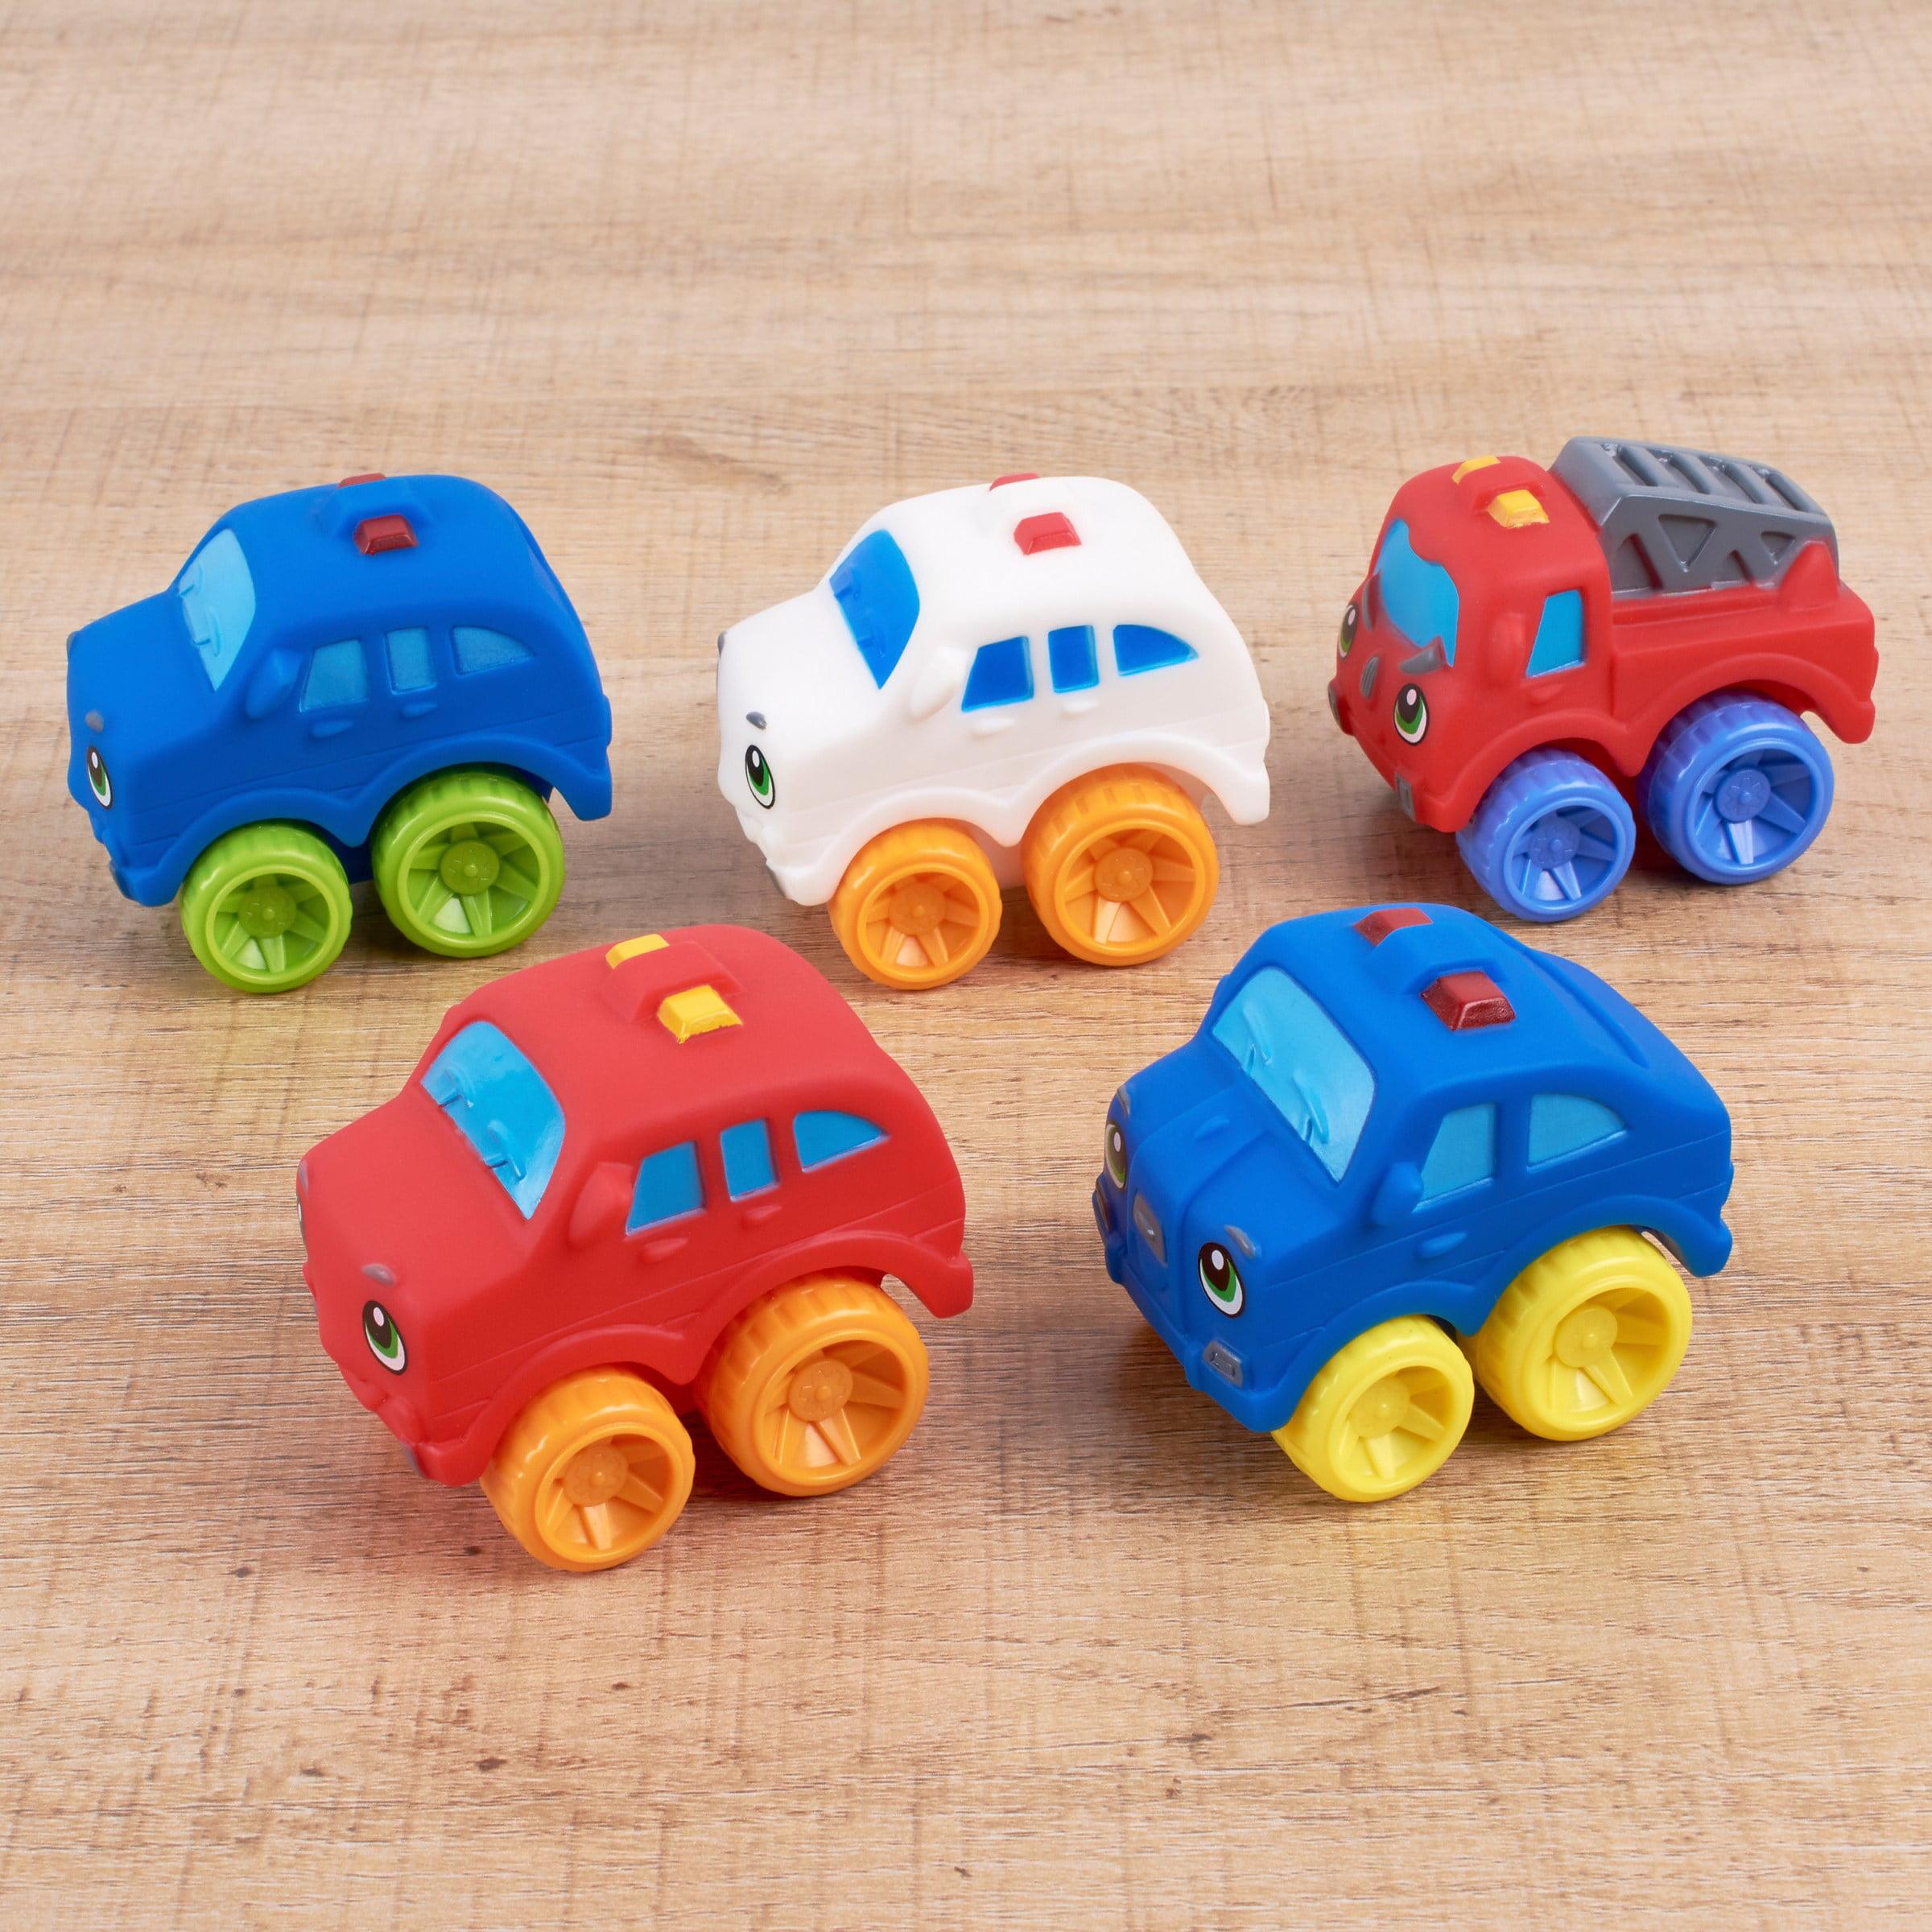 Spark Create Imagine 5-Piece Car and Truck Play Set